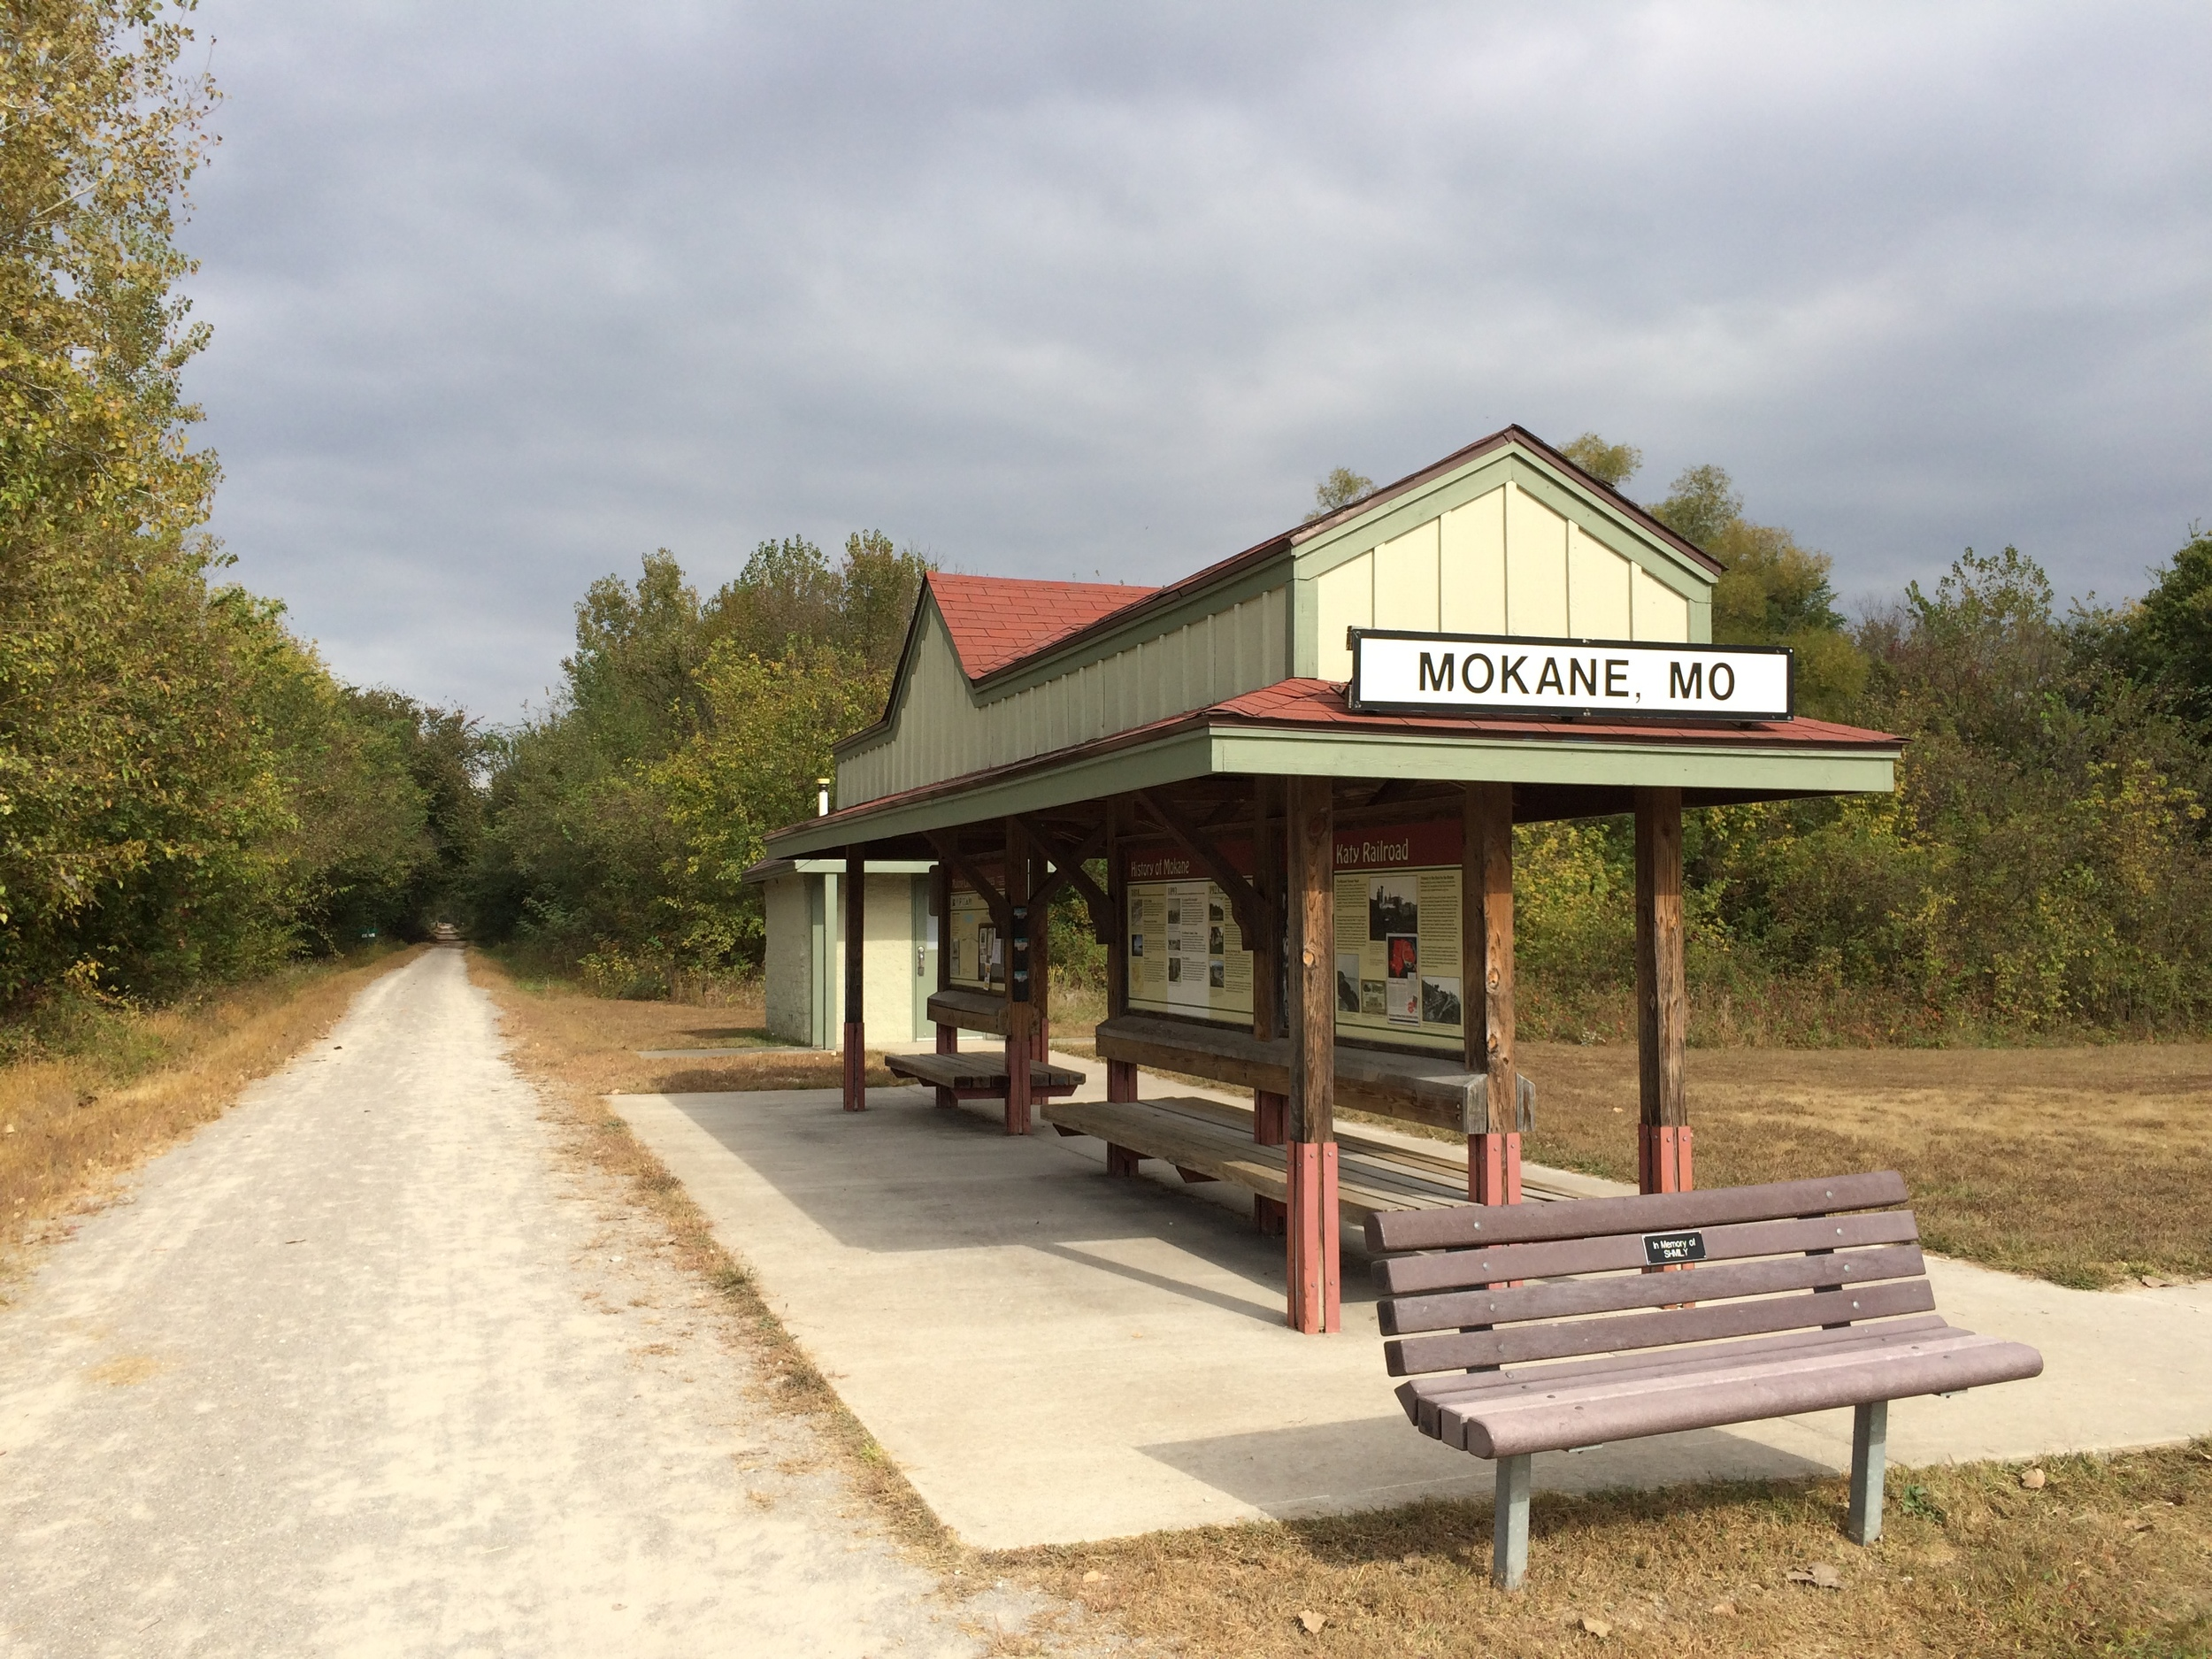 The metropolis of Mokane, Missouri: bench and restroom.